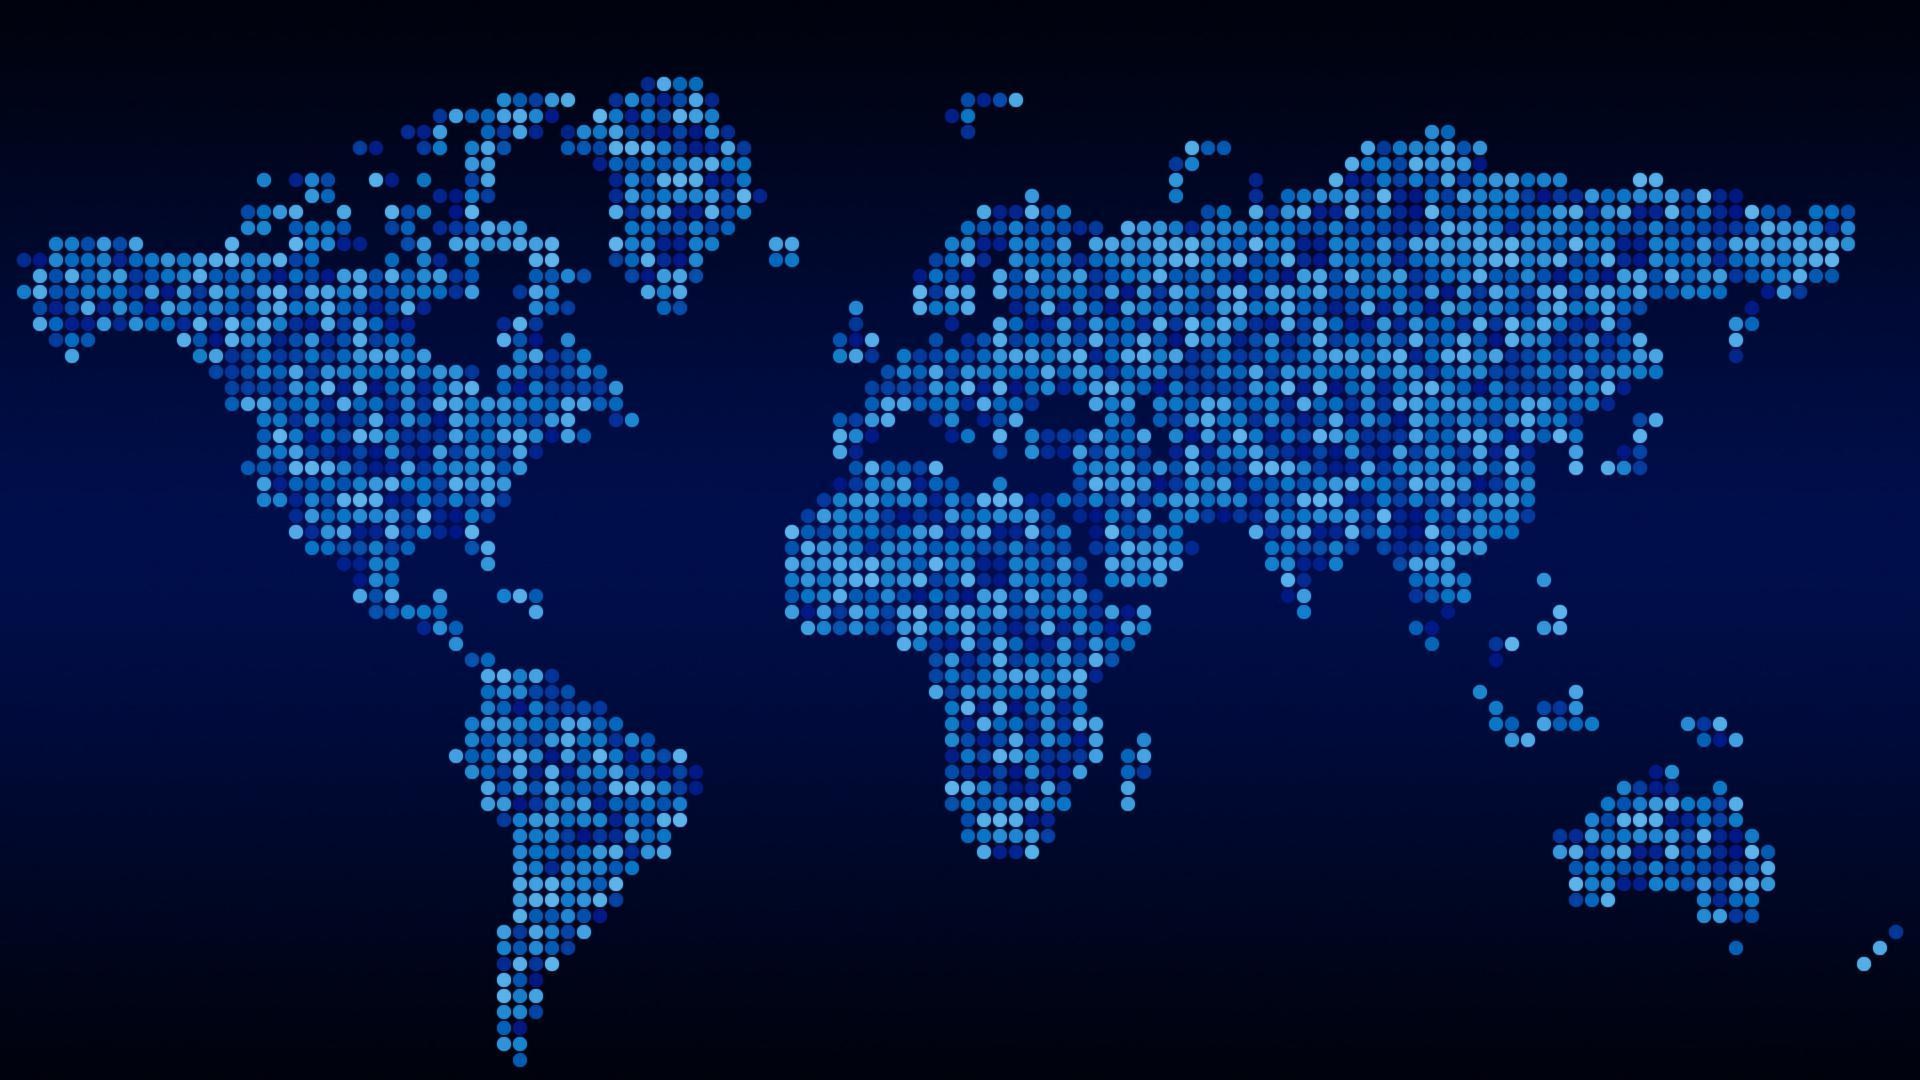 world-map-grapchics-d-free-hd-201049 - DeepWater Buoyancy